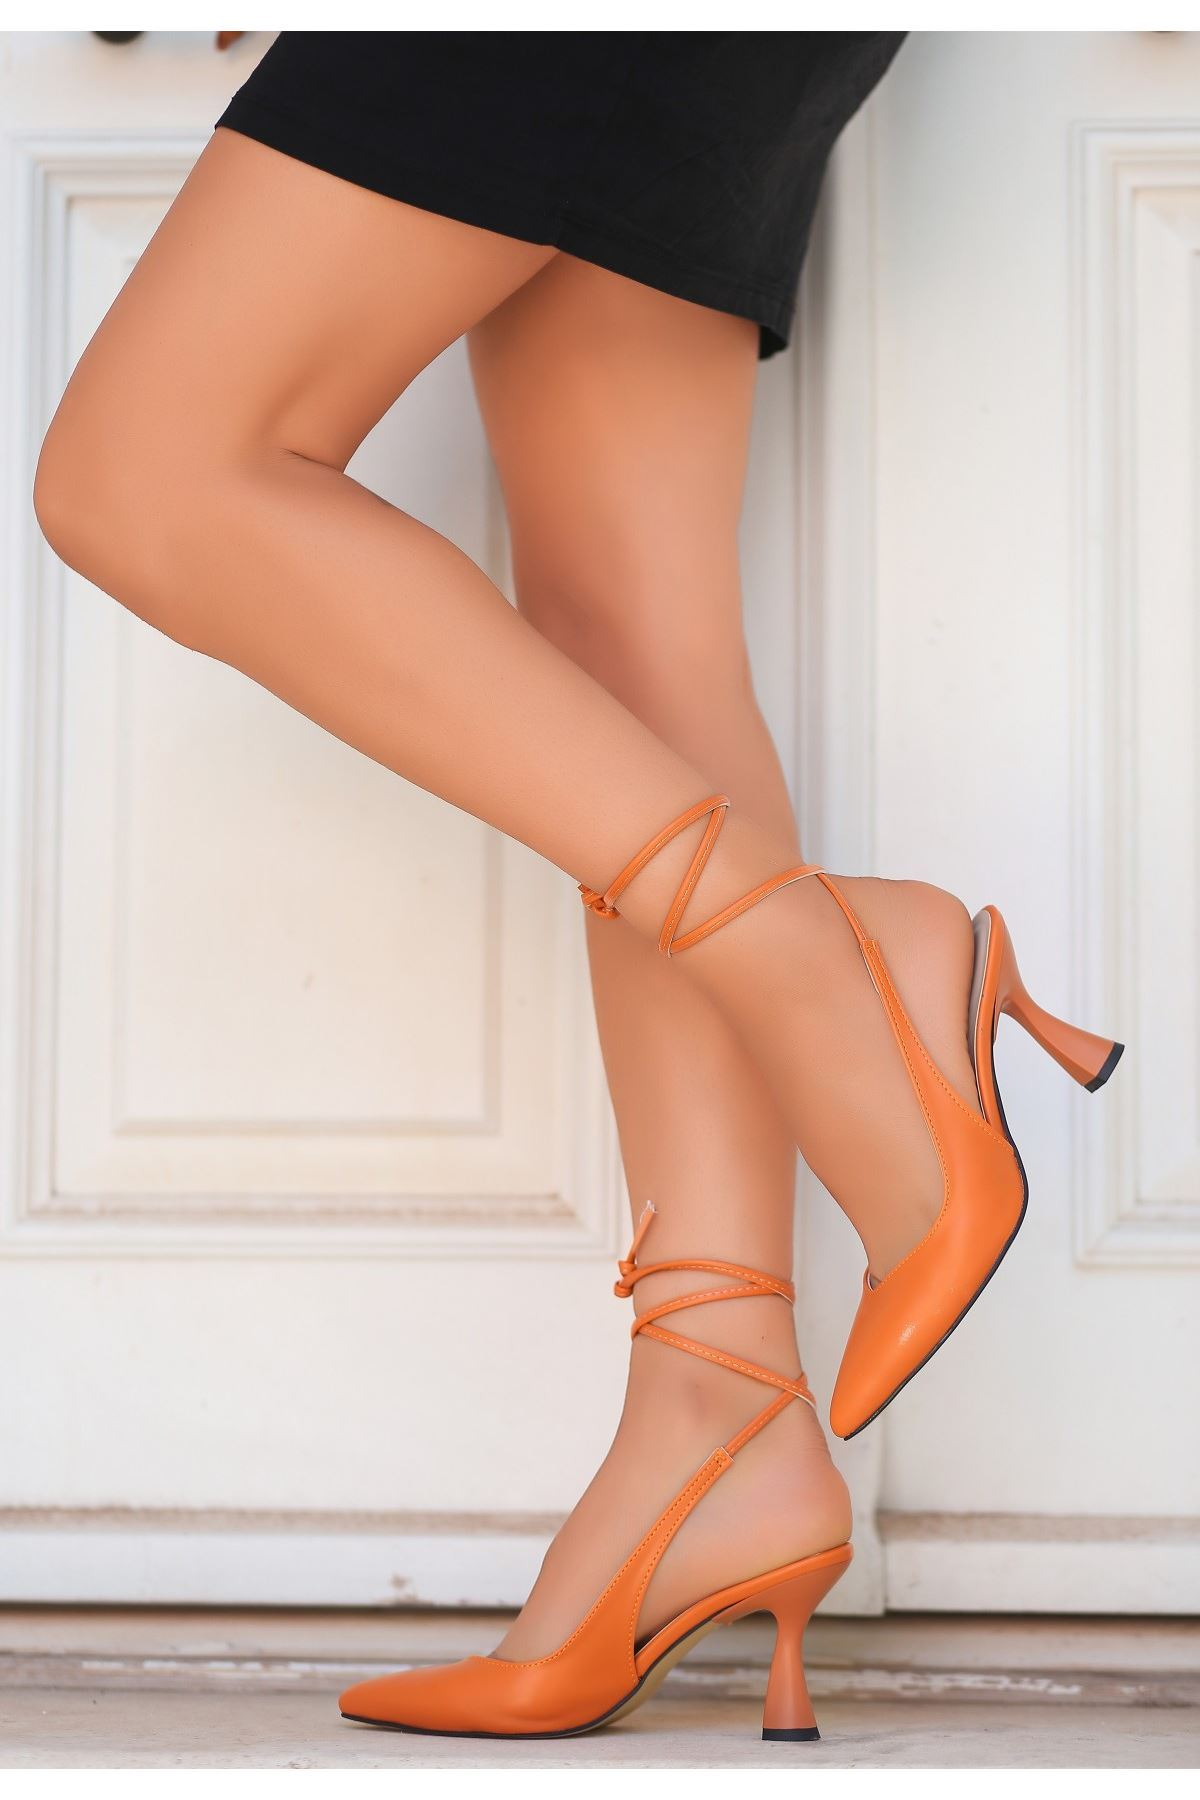 Wonna Turuncu Cilt Topuklu Ayakkabı